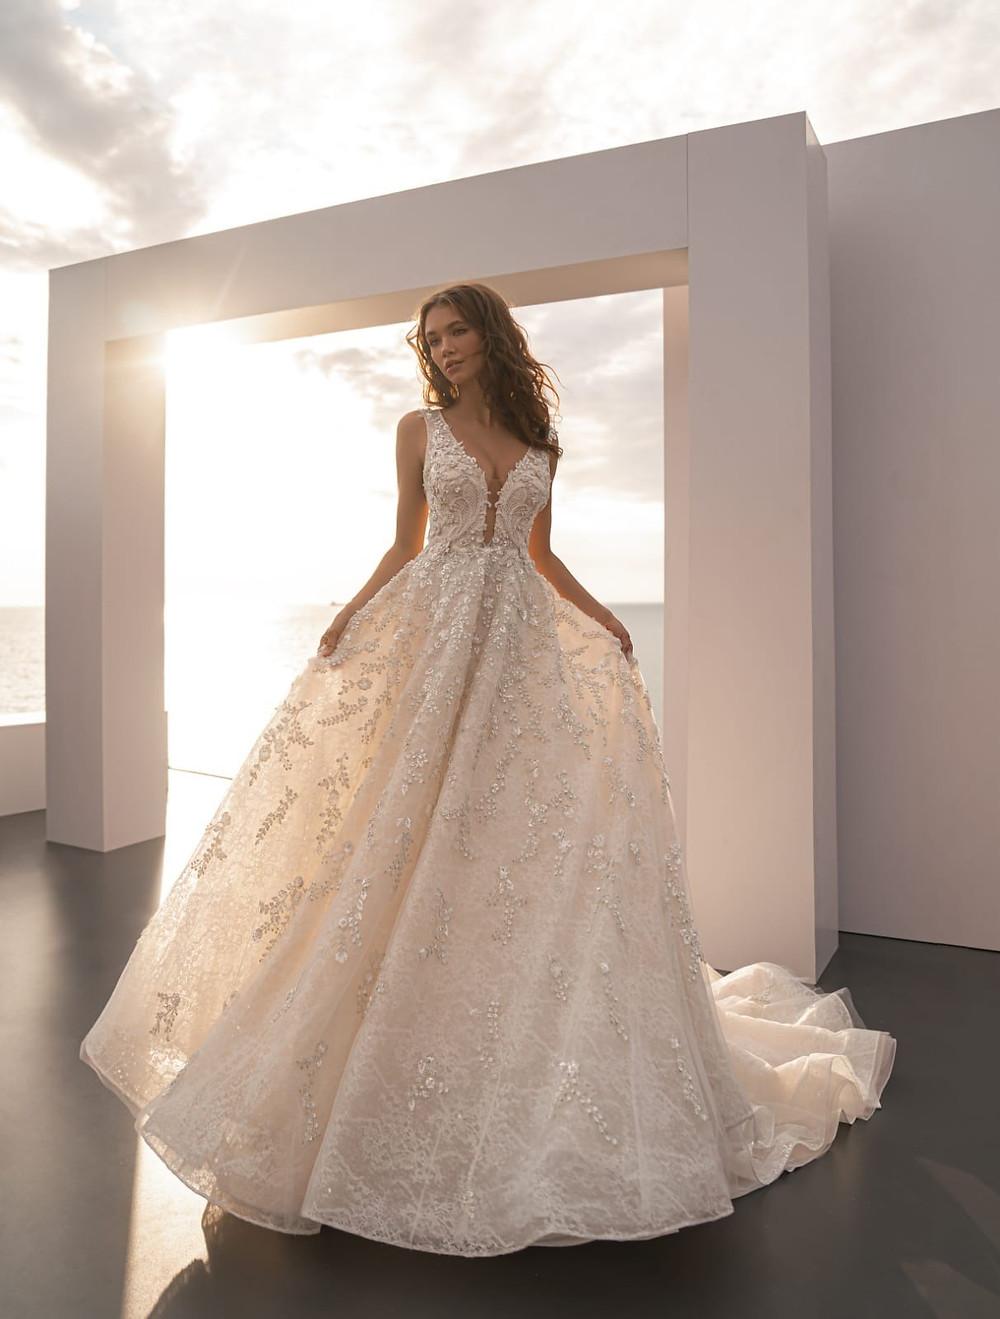 rochi mireasa, rochie mireasa, rochii de mireasa bucuresti